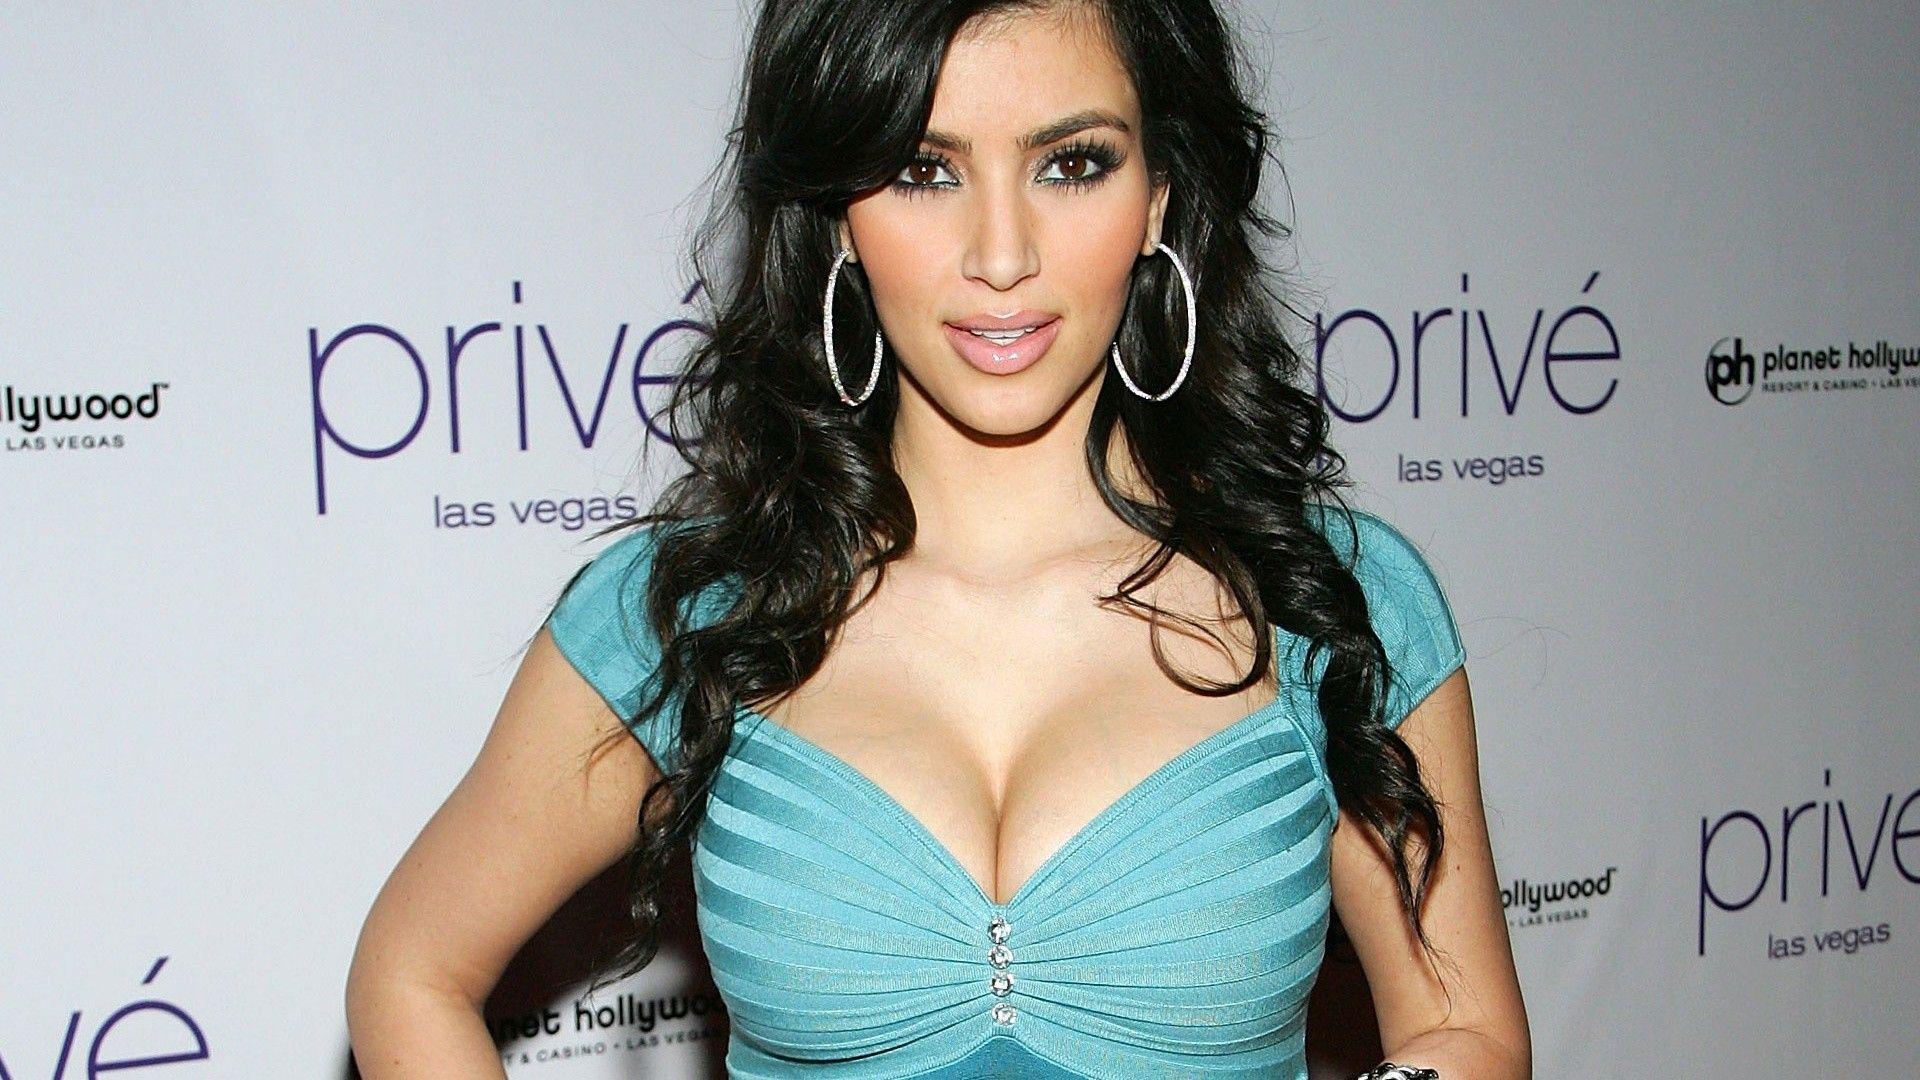 Kim Kardashian Hot Girl Stuff to Buy Pinterest Kim